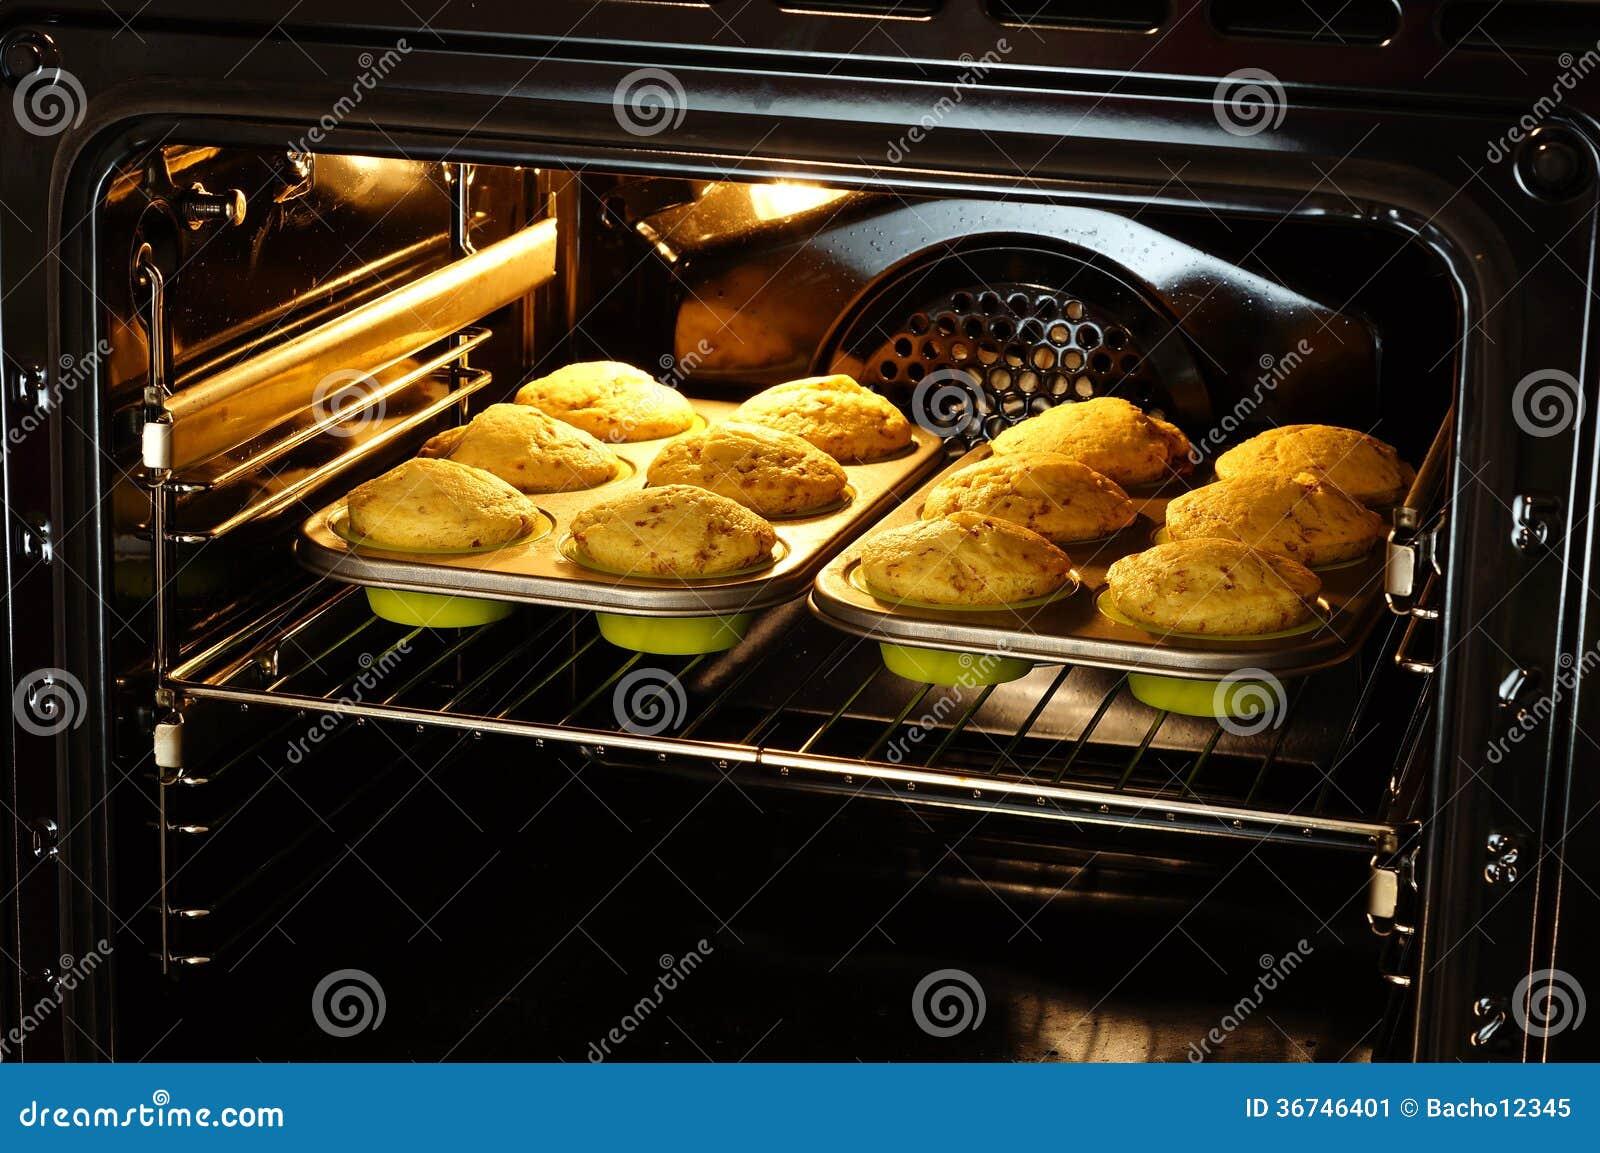 Bakselmuffins in oven